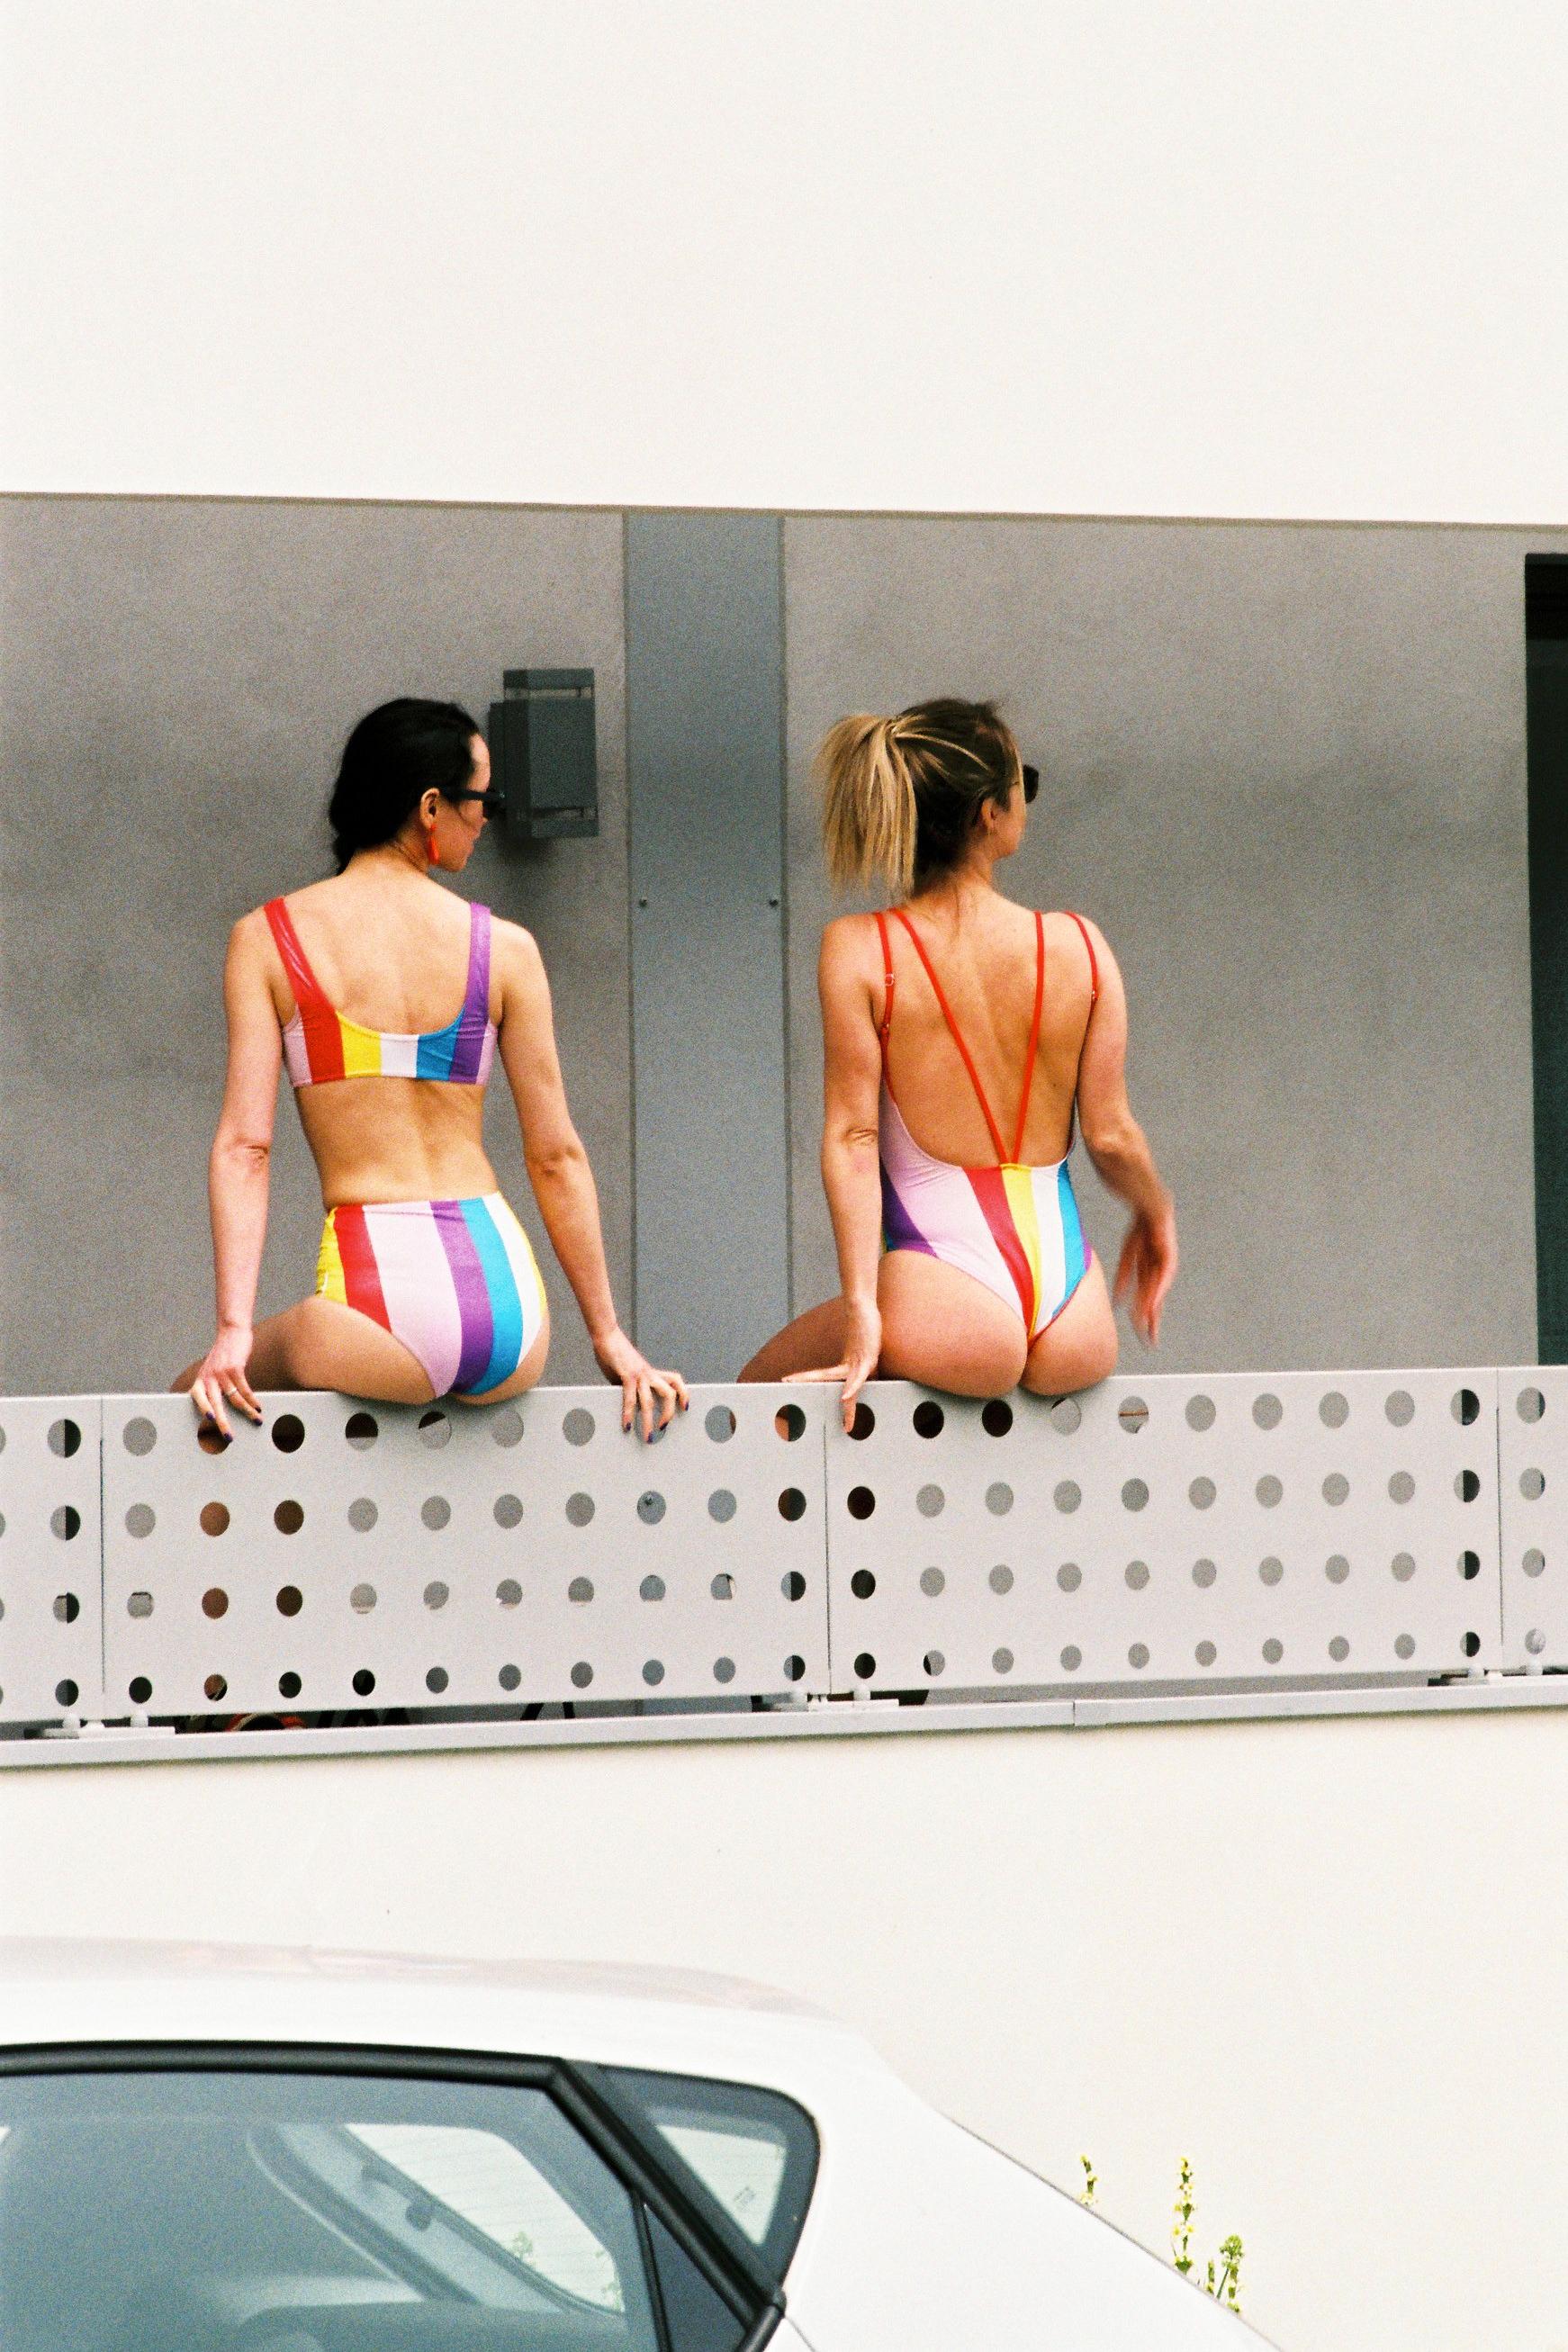 les rituelles edito maillots de bain swimwear vintage feel paris eshop lingerie_03 (1).jpg